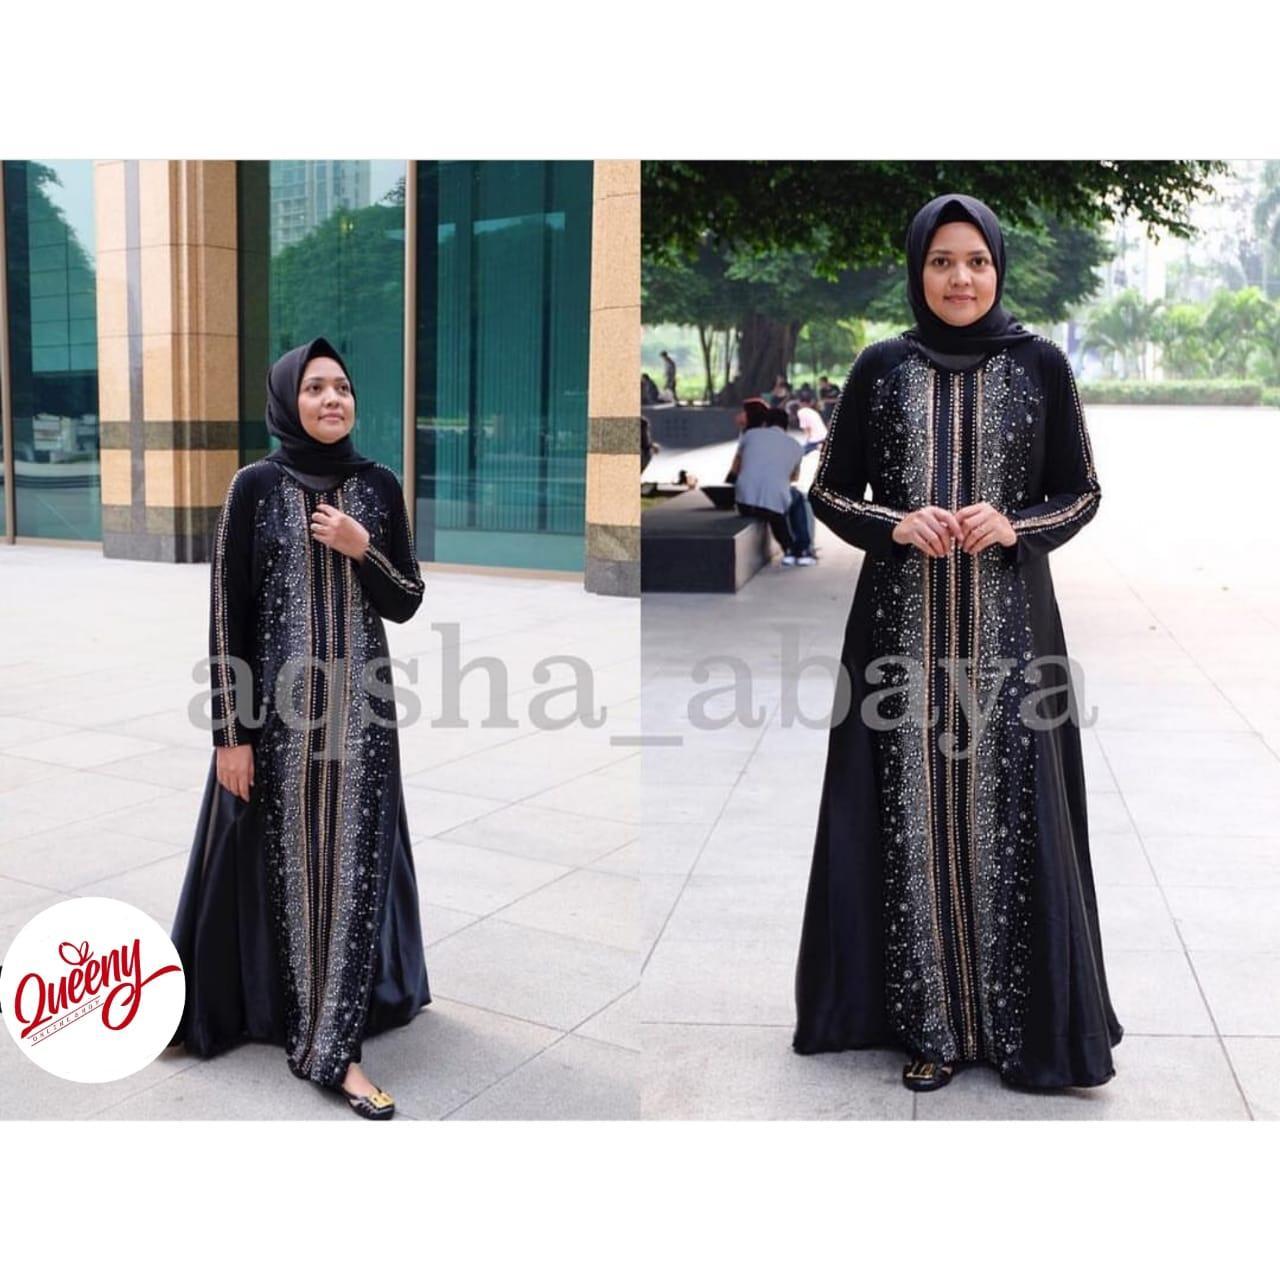 gamis abaya muslimah / abaya arab islami / abaya satin marbella fashion muslim kombinasi payet mewah